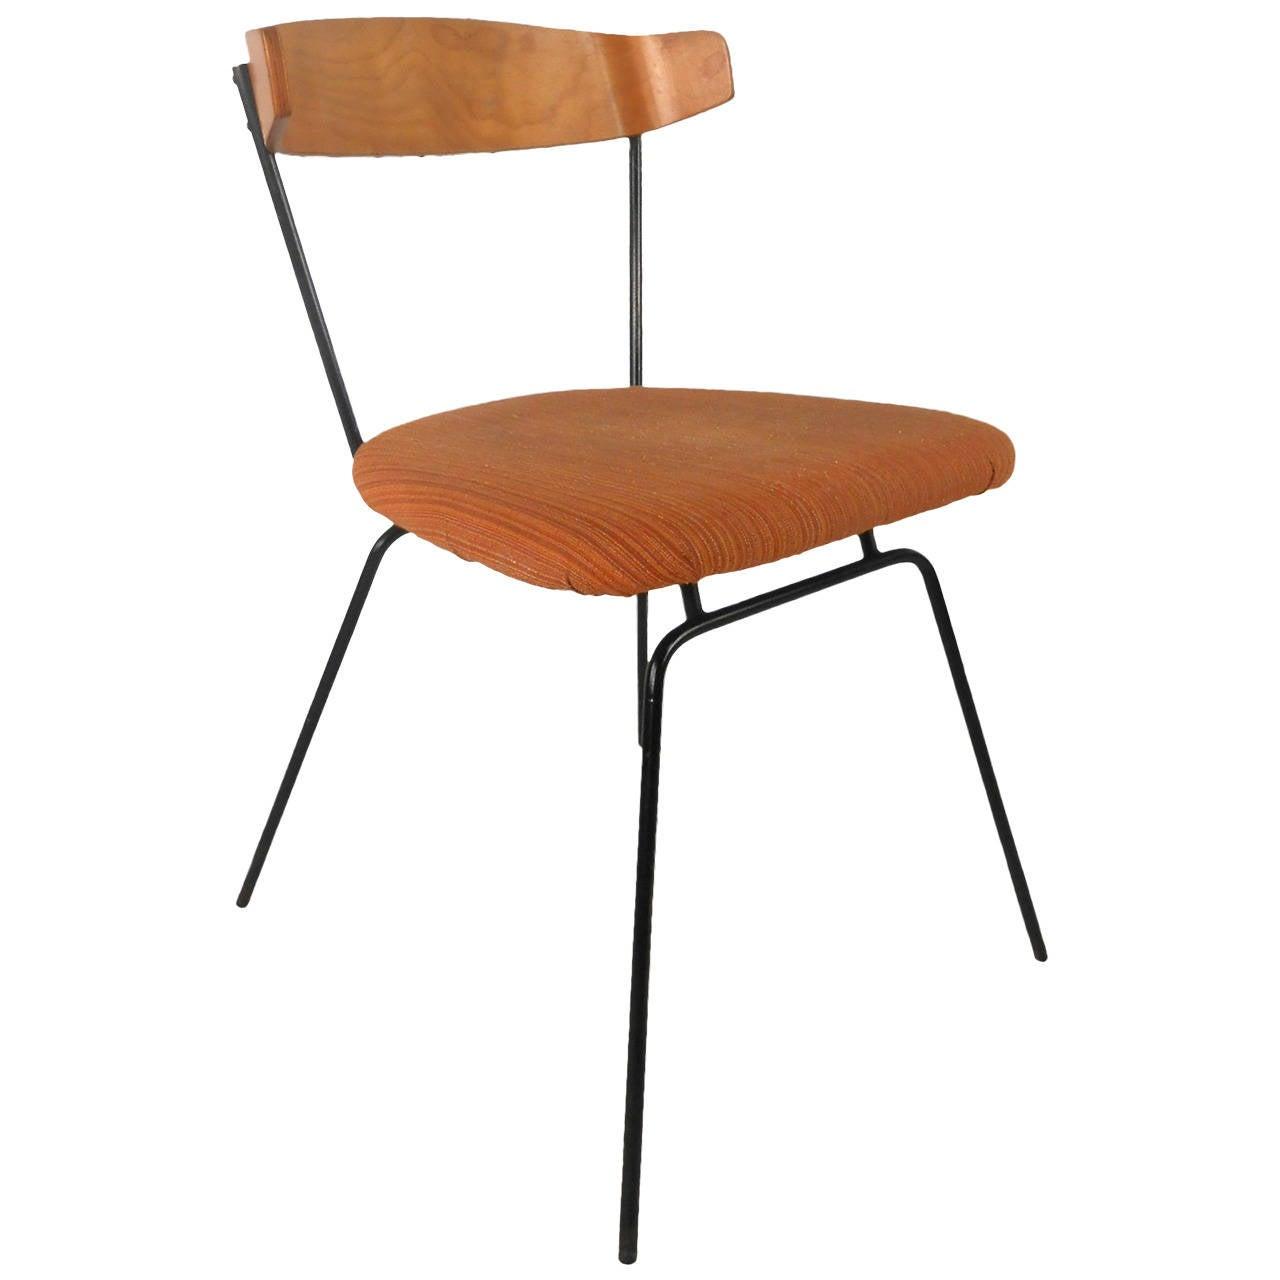 bent wood dining chairs ergonomic chair nsn mid century modern paul mccobb 1535 style bentwood